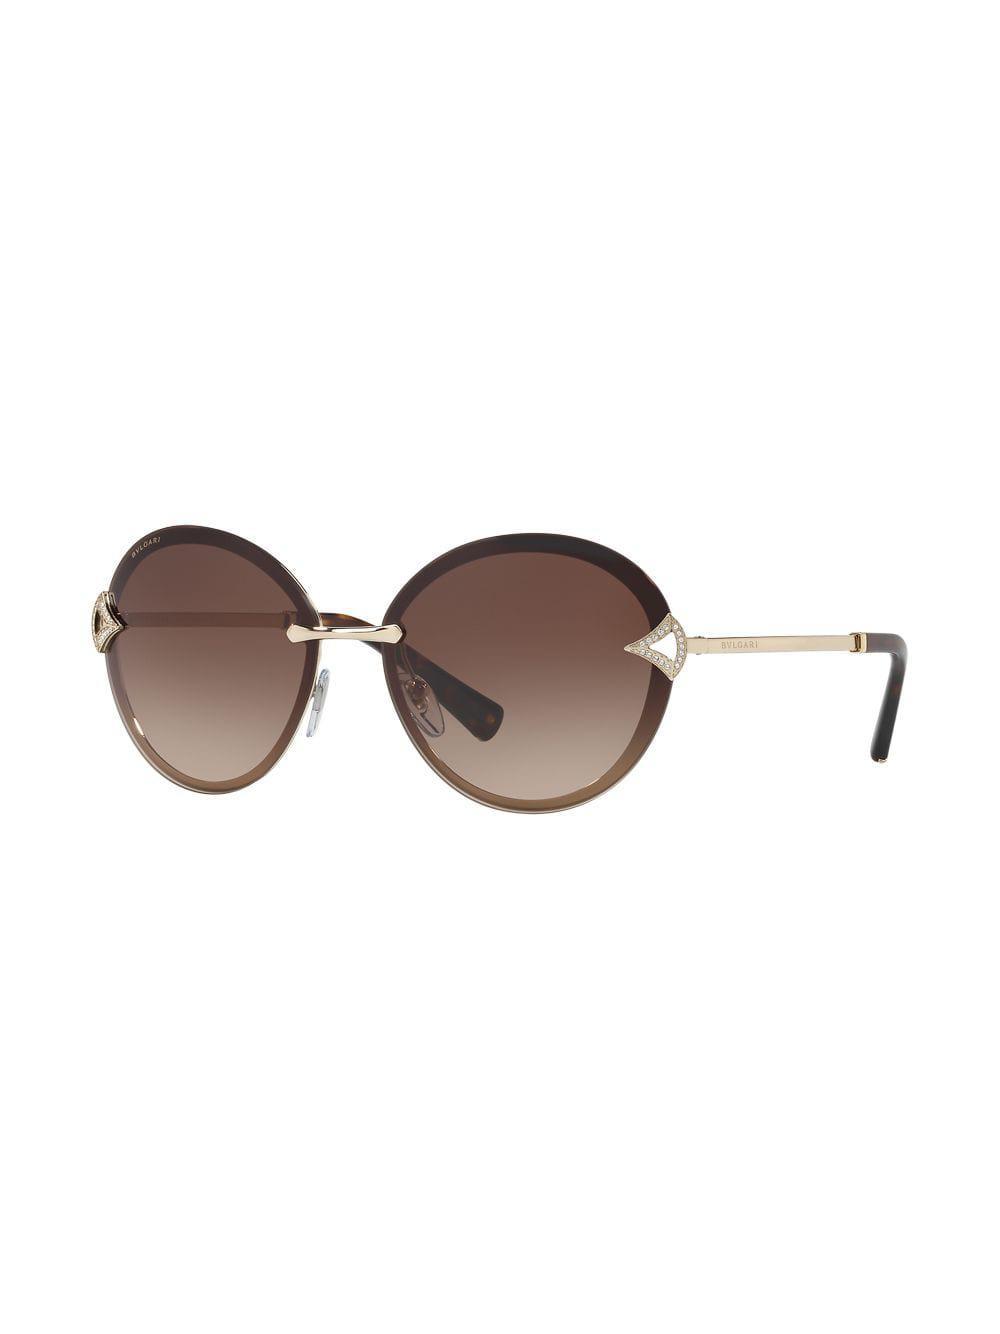 Round In Lyst Metallic Sunglasses Frame Crystal Embellished Bvlgari REqXwxp